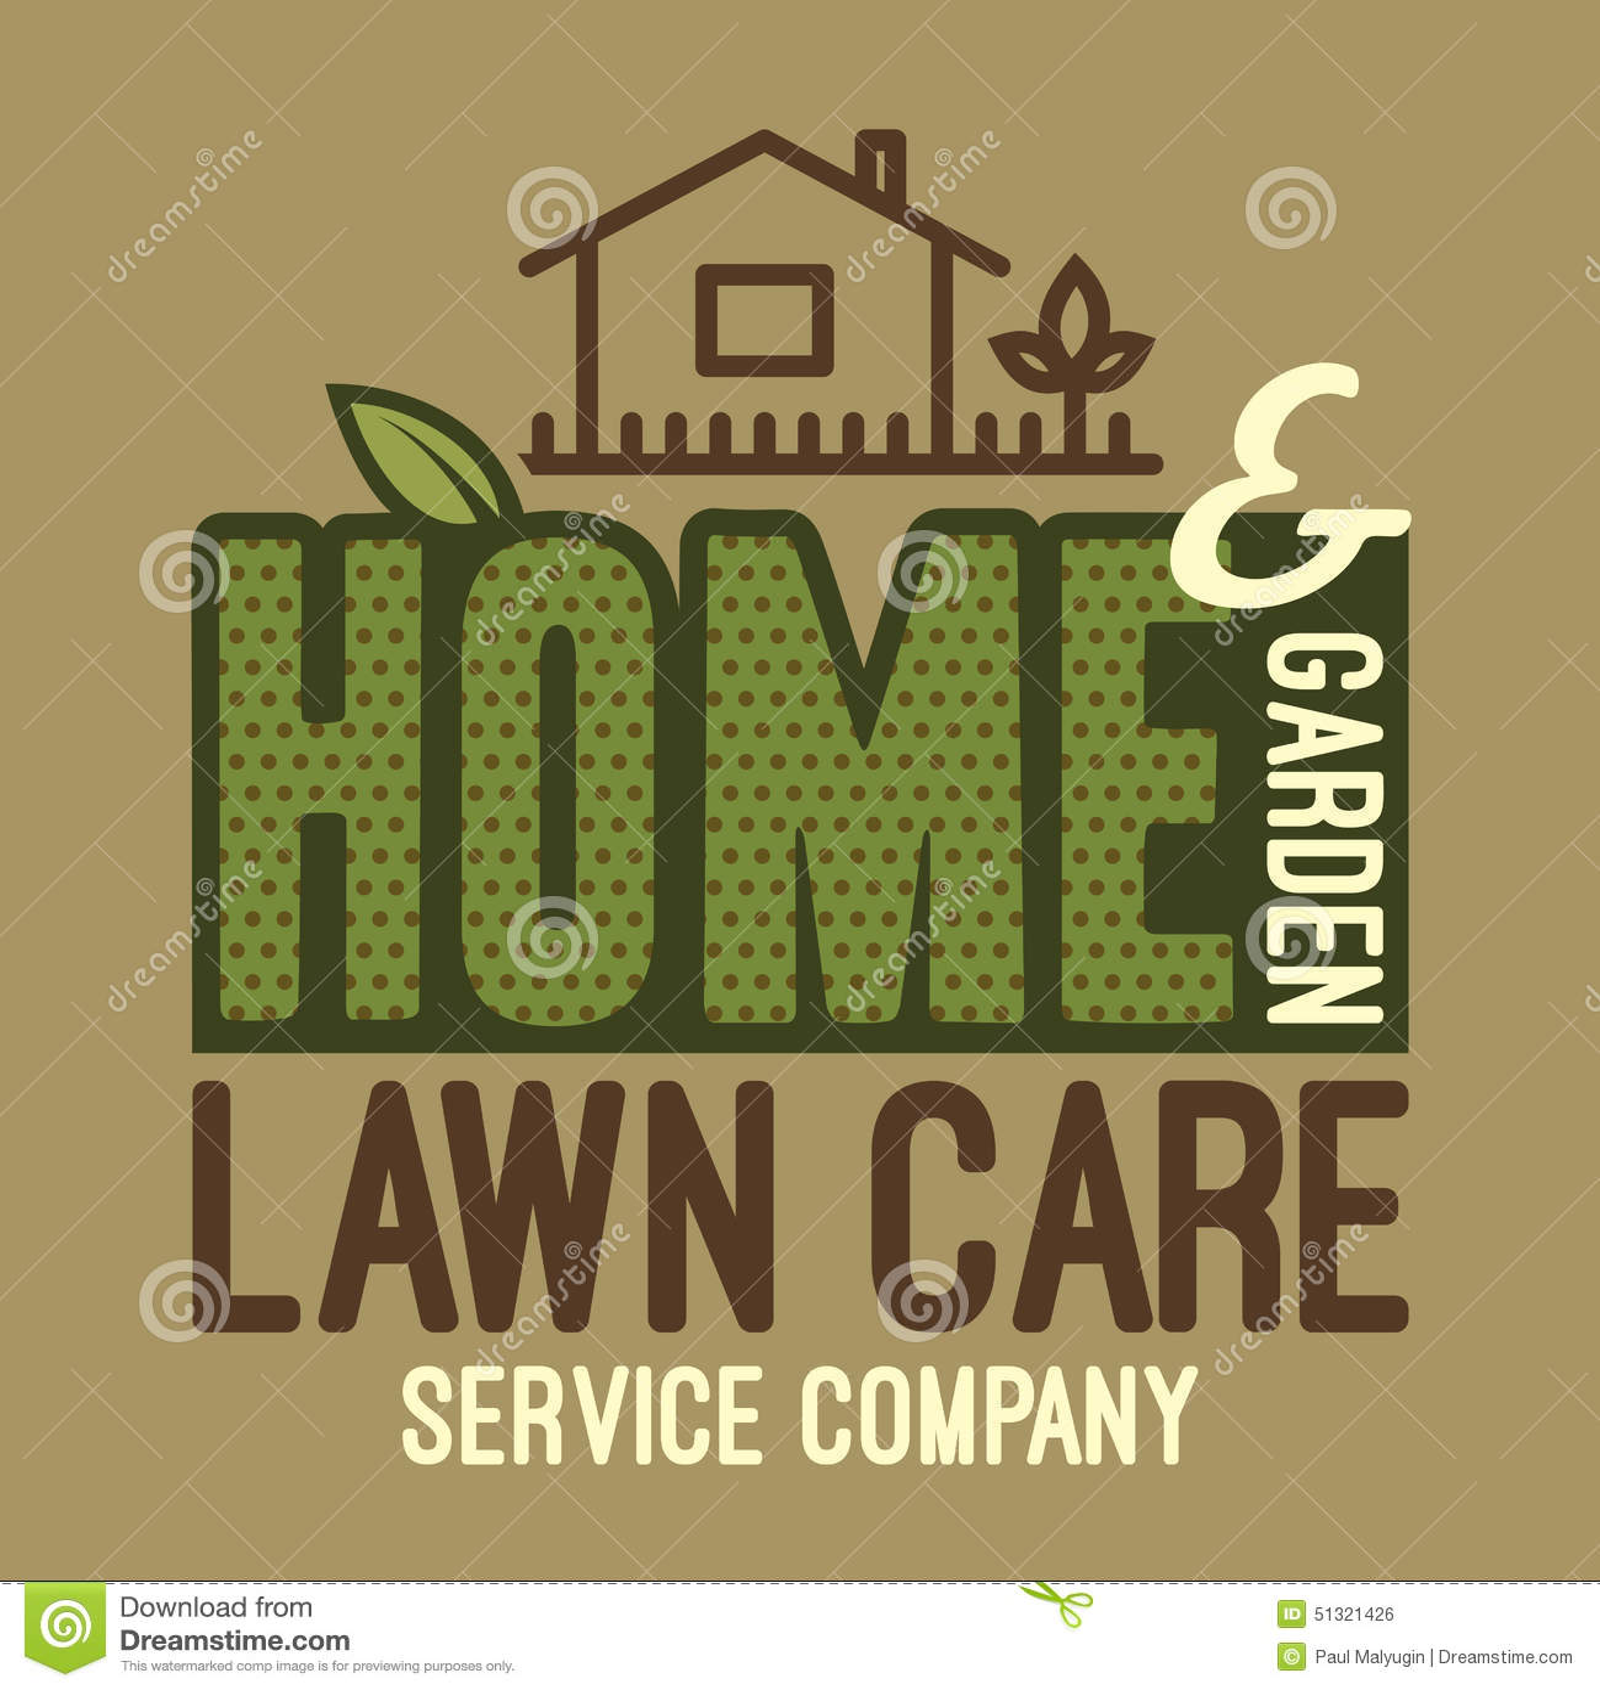 Lawn Care Logo Vector Illustration 57371226